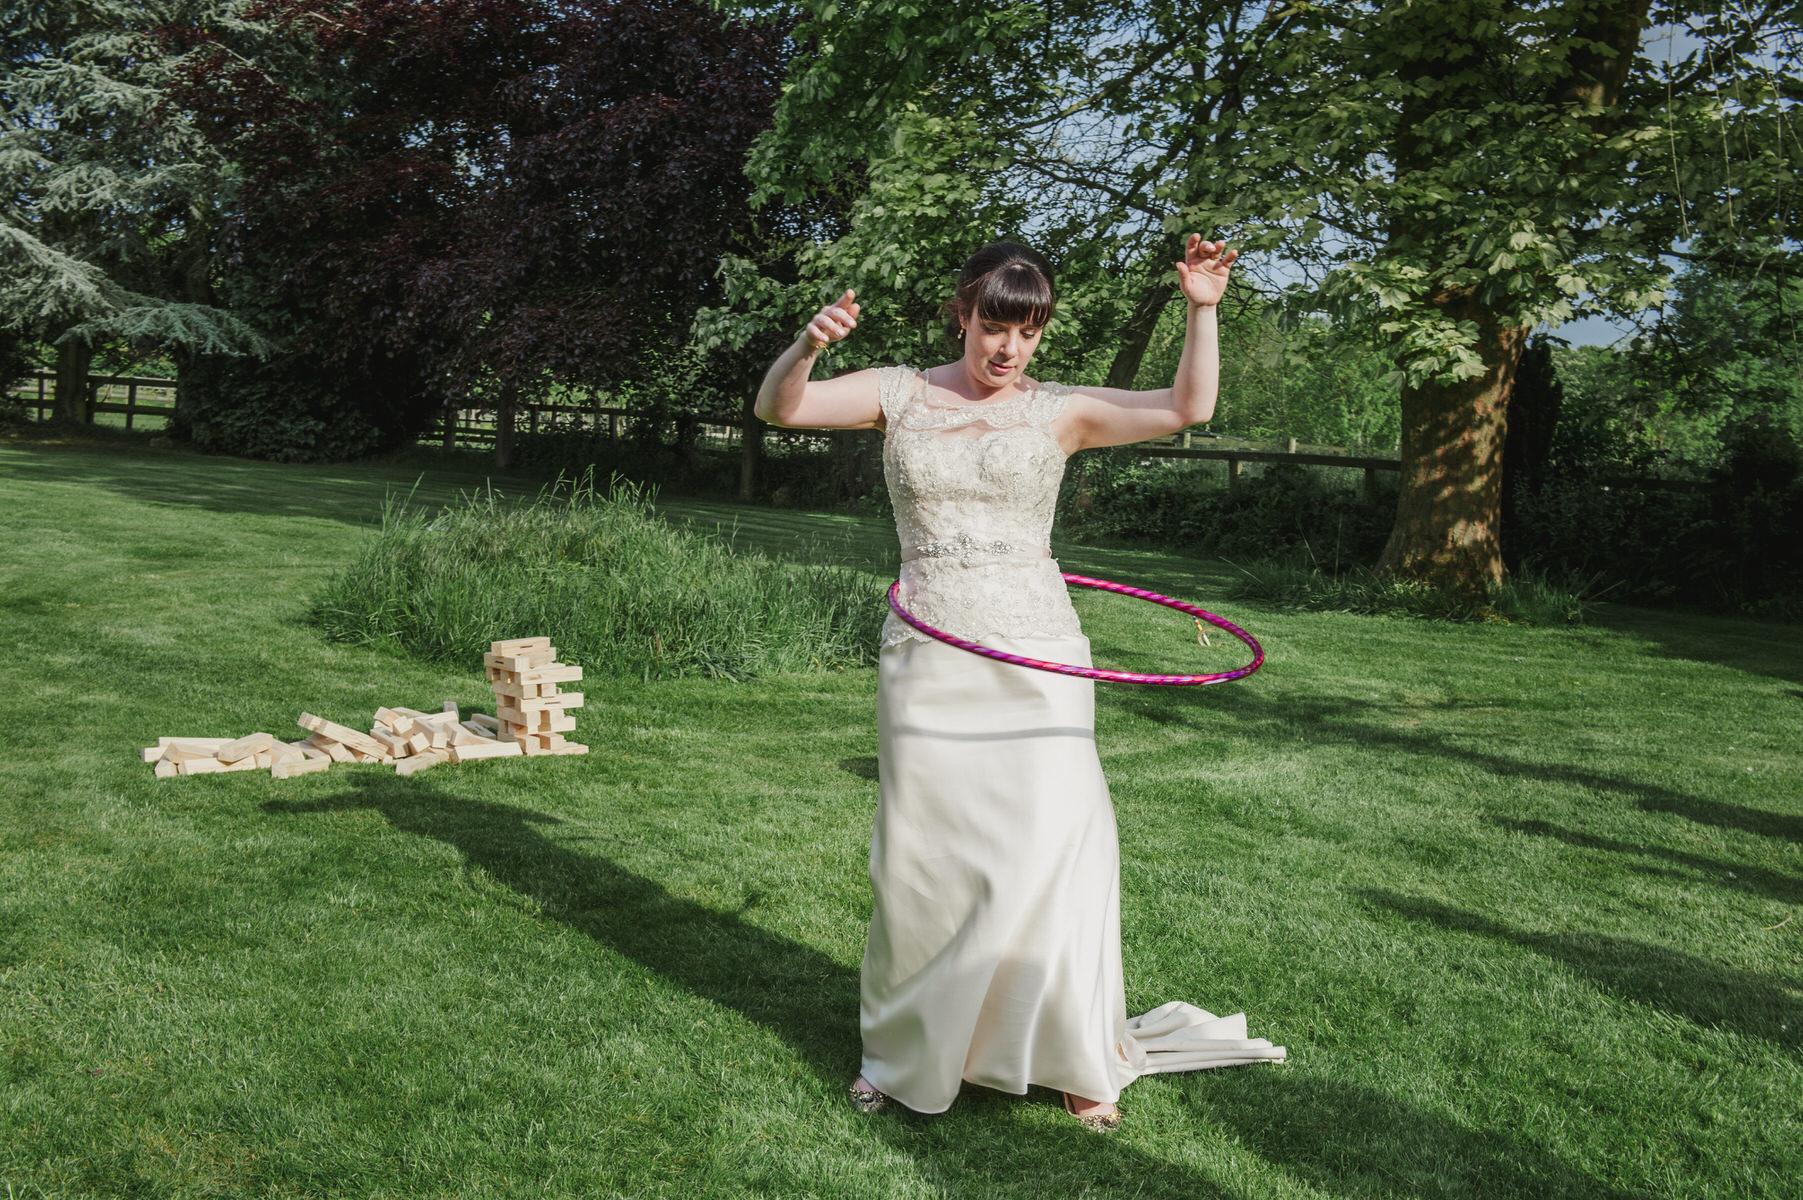 Heron S Farm Wedding Photographer Berkshire